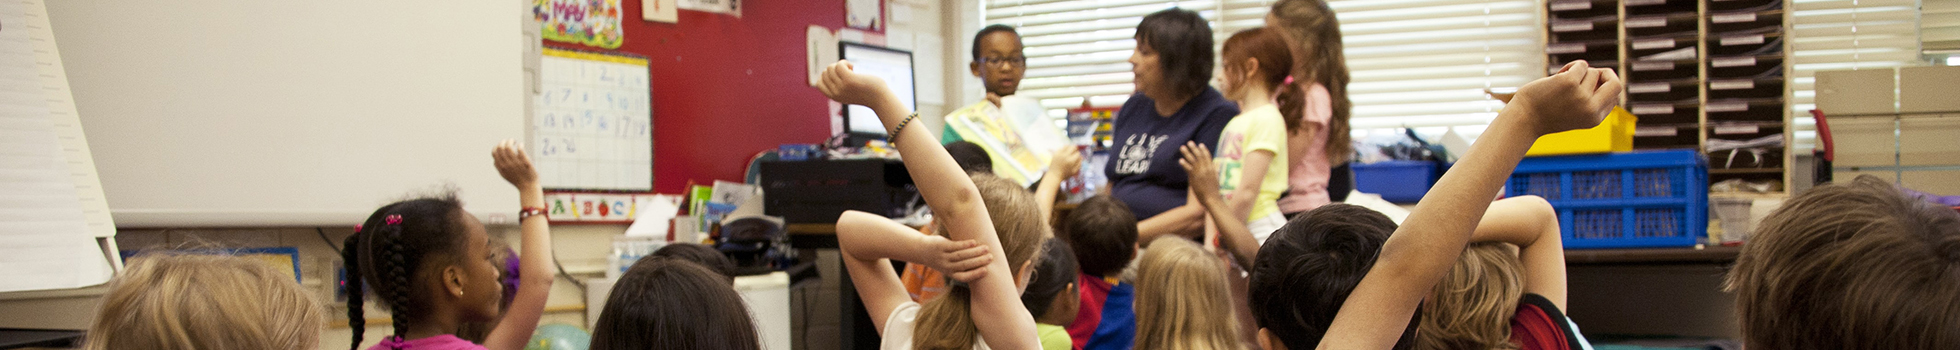 Elementary education classroom.